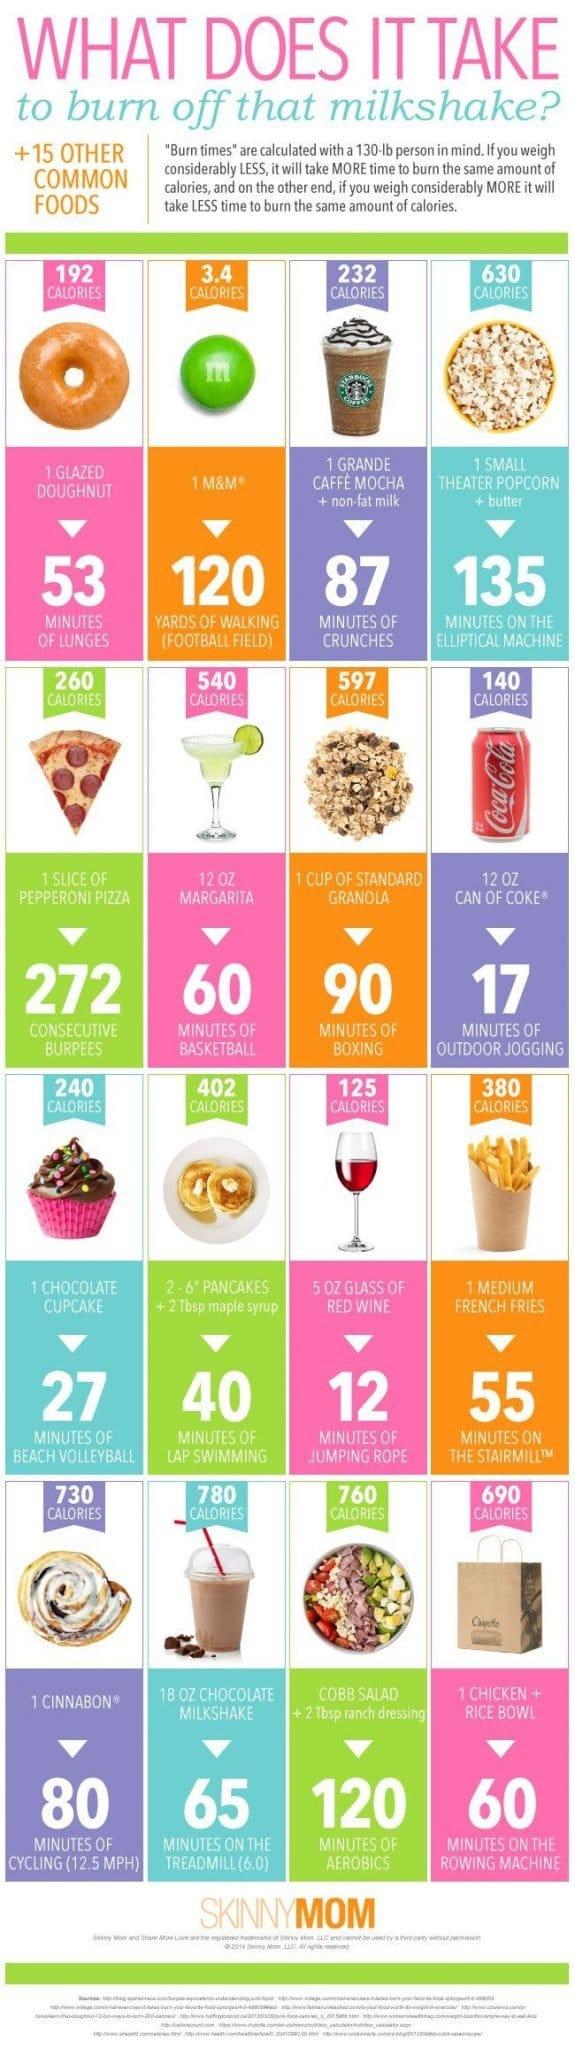 Calorie Calculating